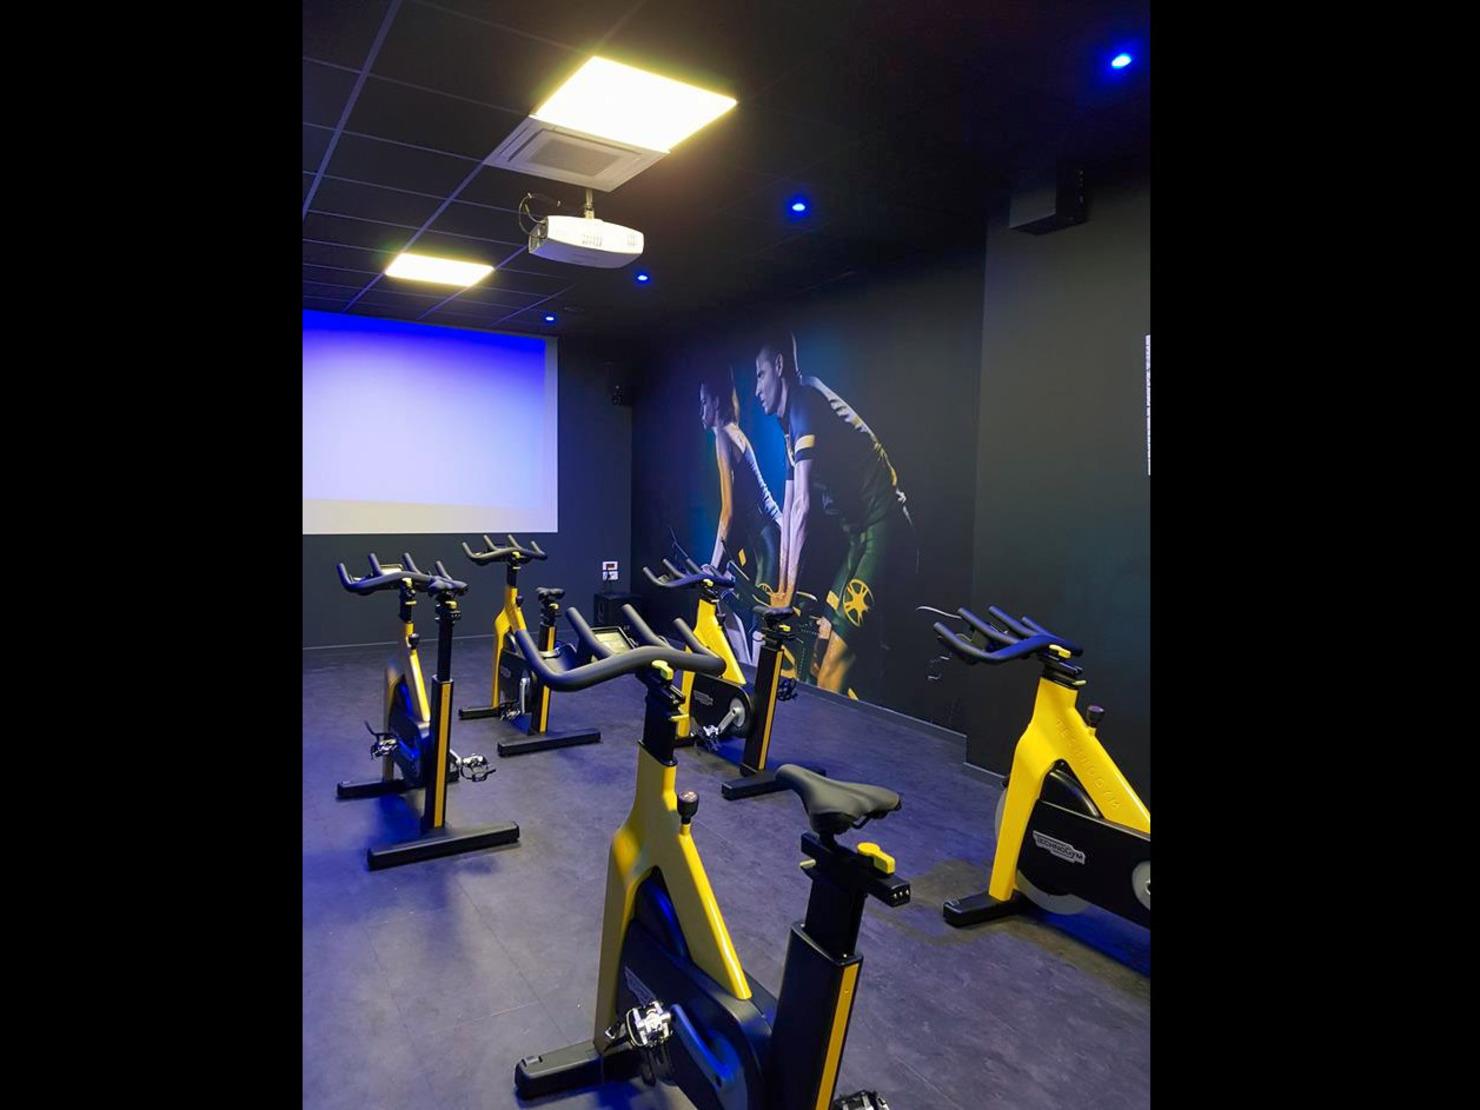 Fitness Park Bretigny sur Orge